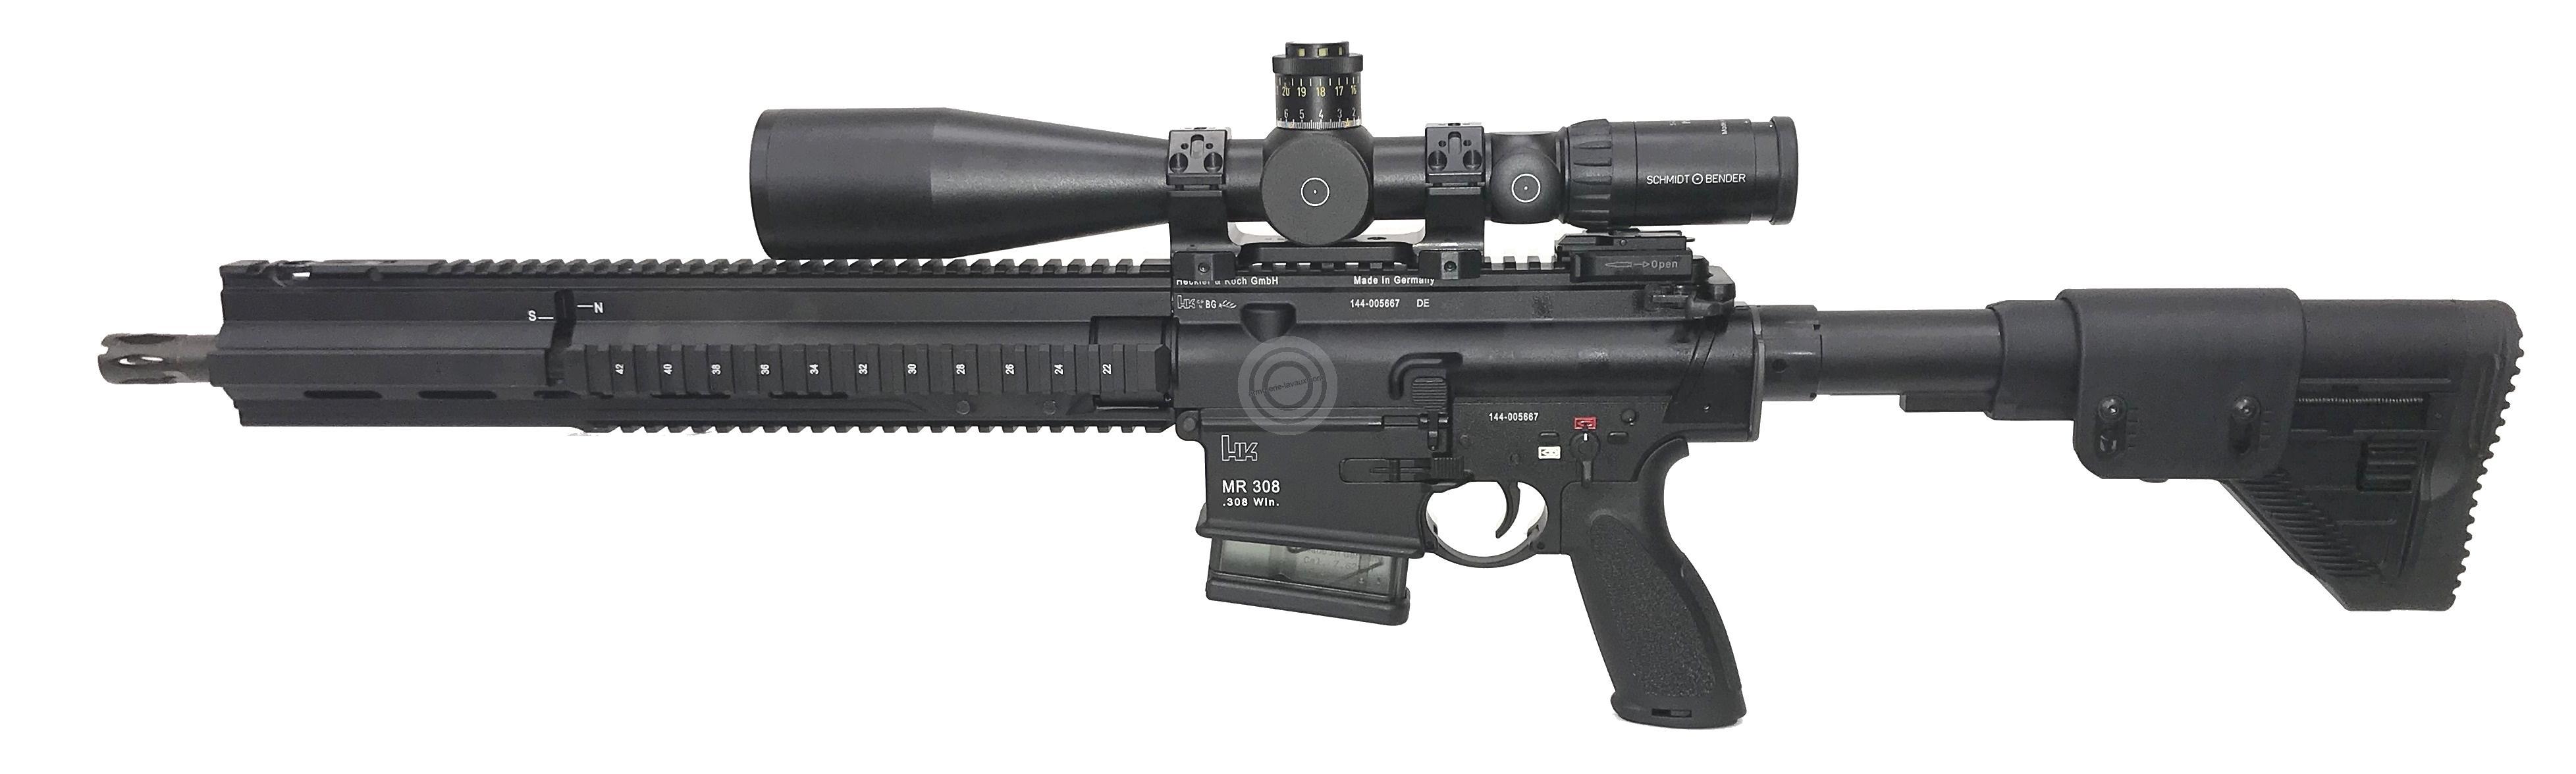 Carabine HK MR308 A3 G28 16.5